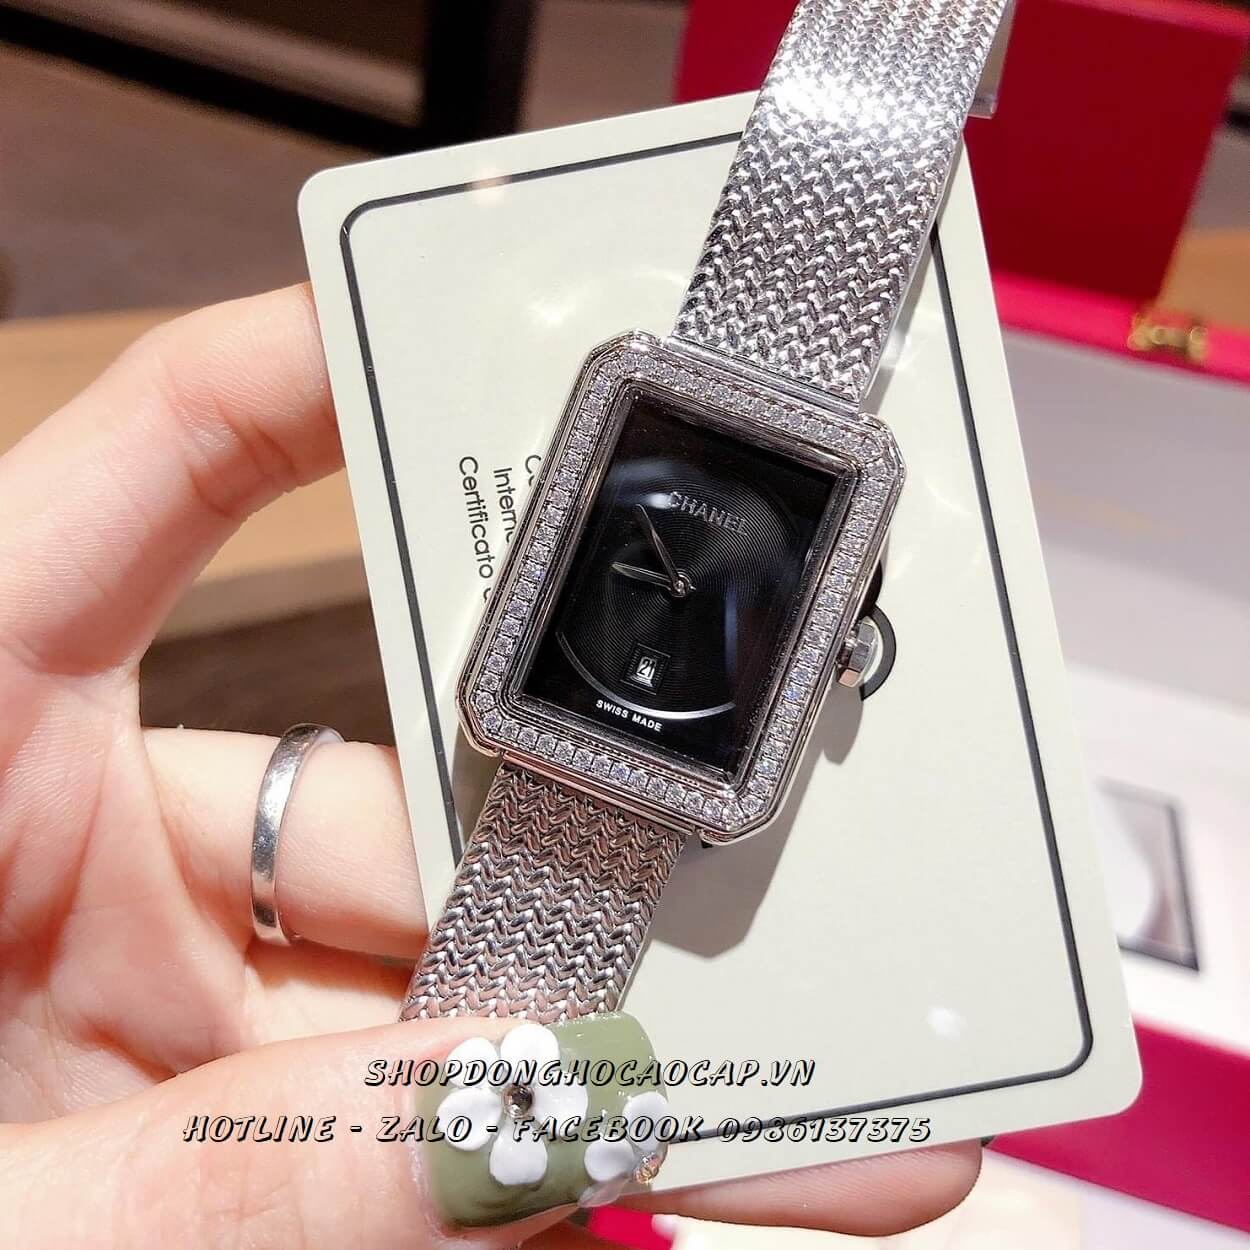 Đồng Hồ Chanel Boy Friend Nữ 25x32mm - Mặt Đen